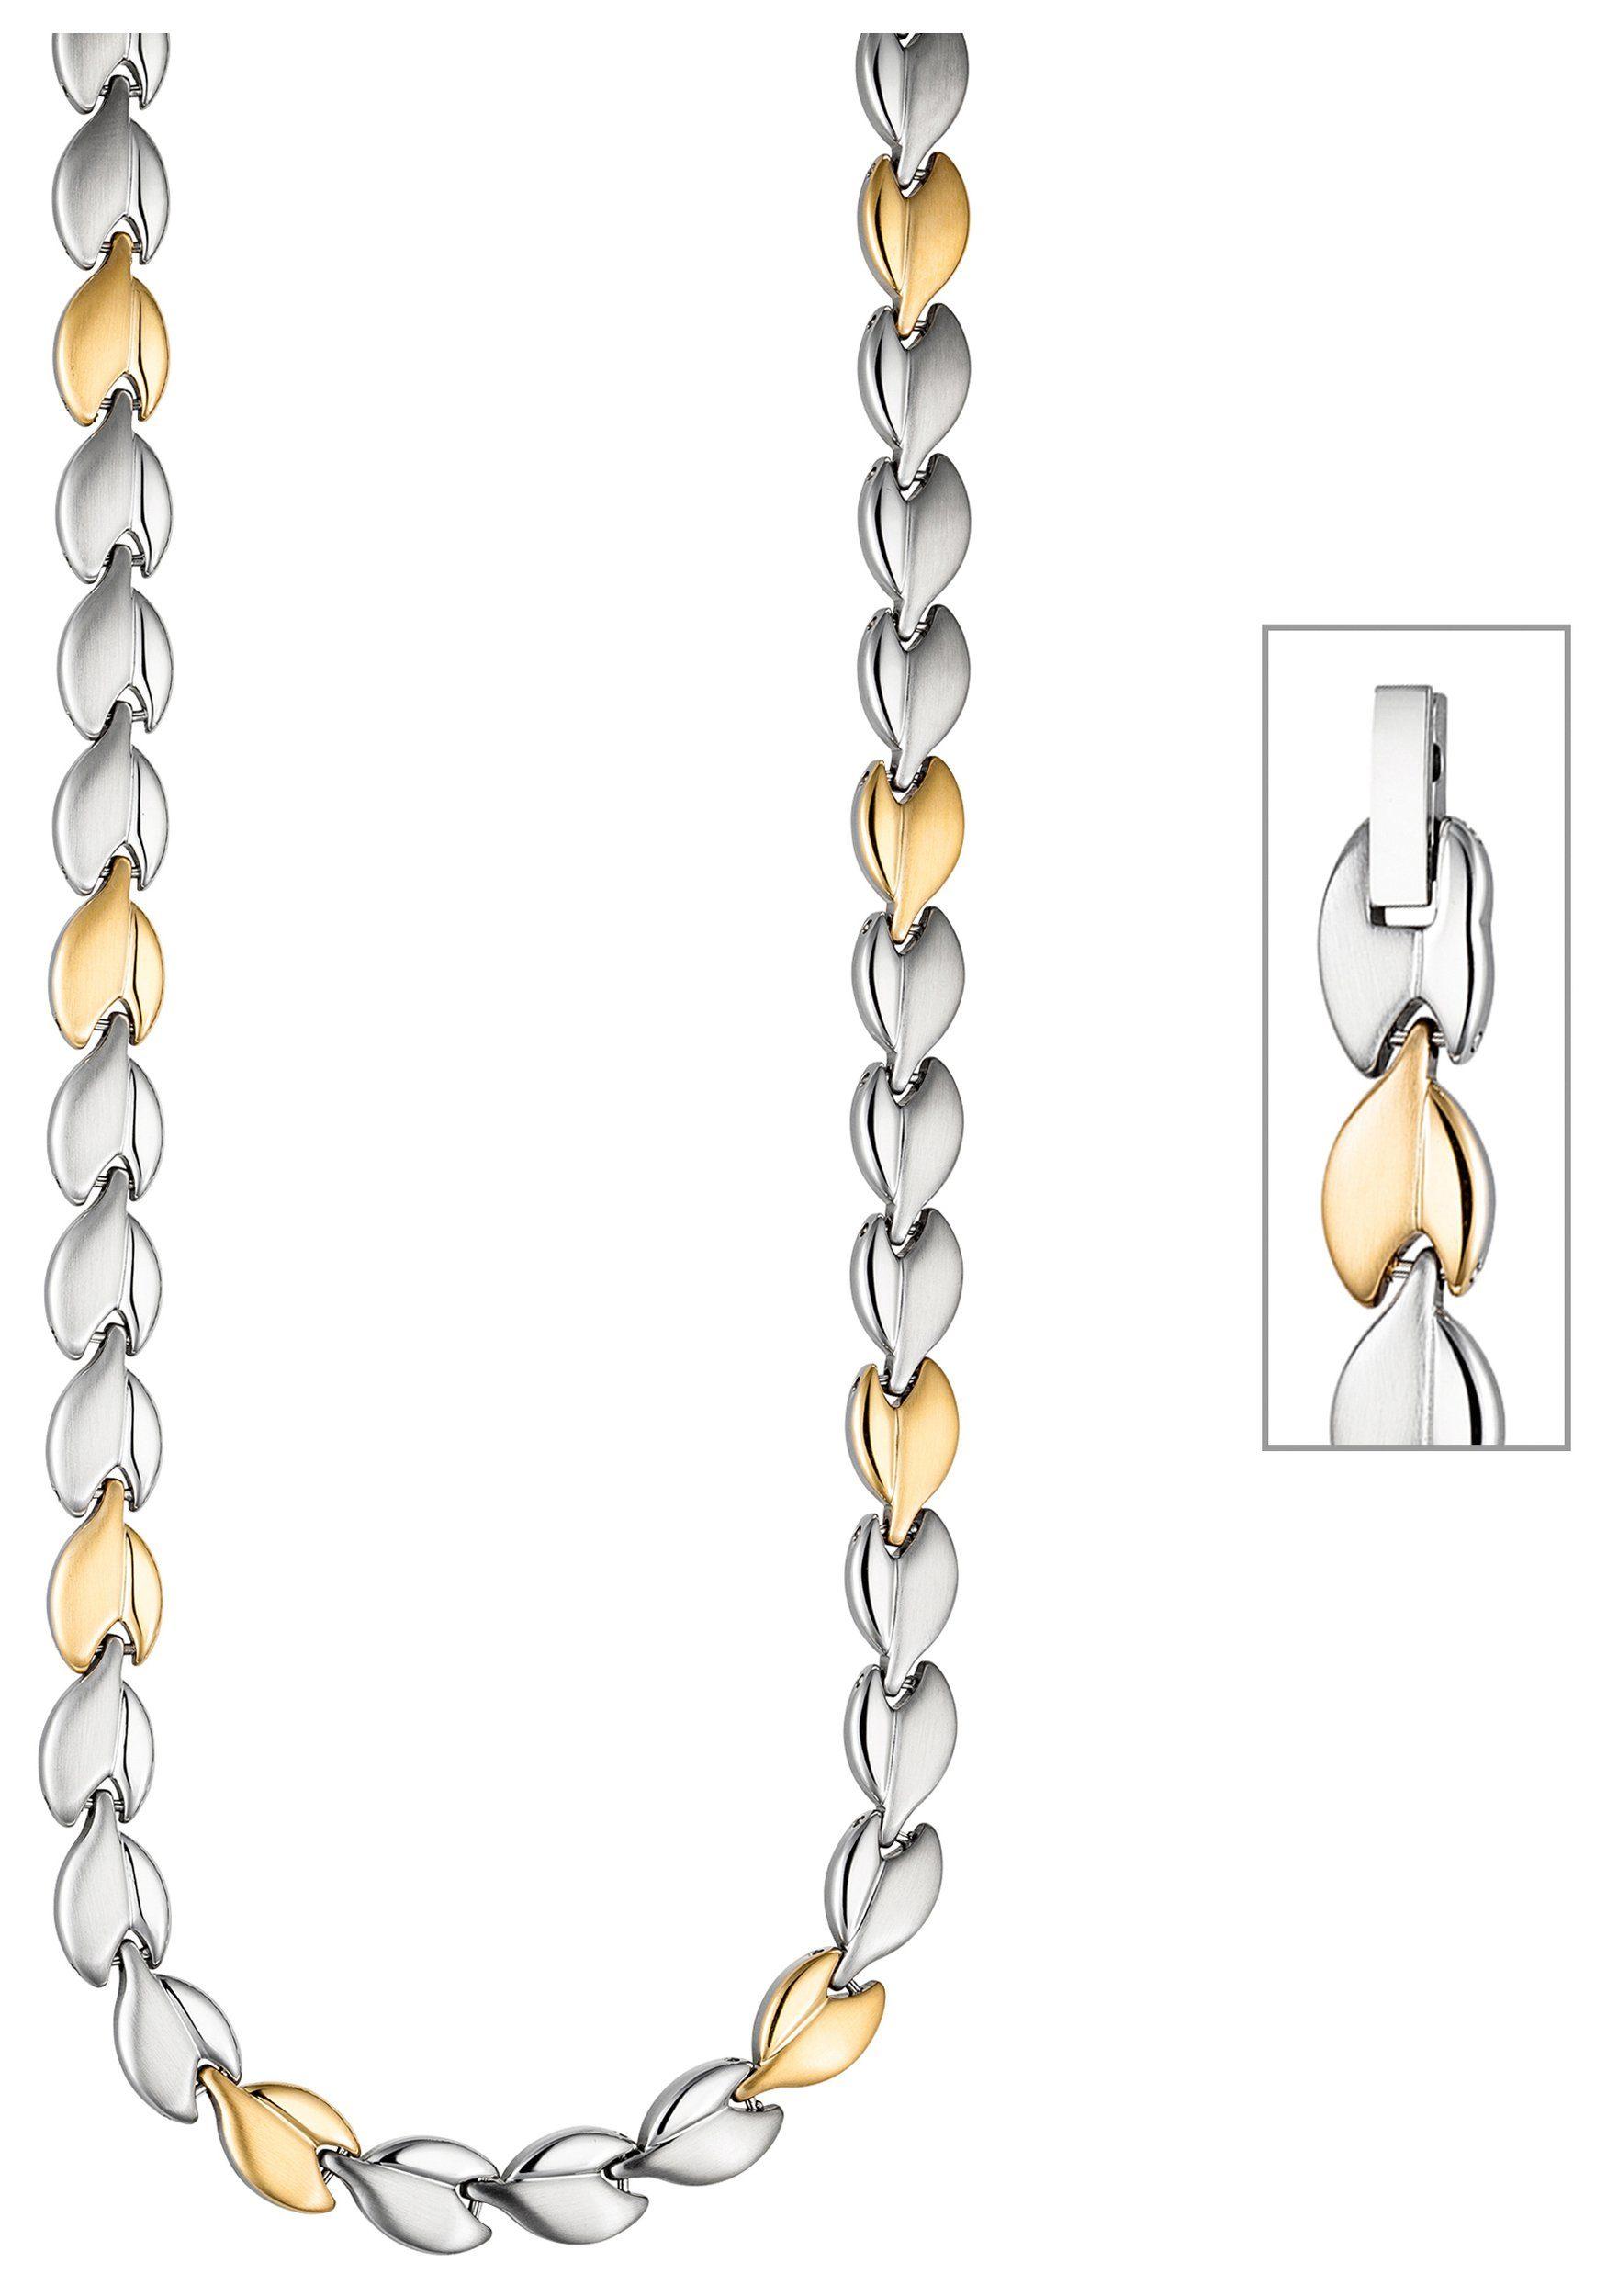 JOBO Collier Edelstahl goldfarben bicolor 45 cm